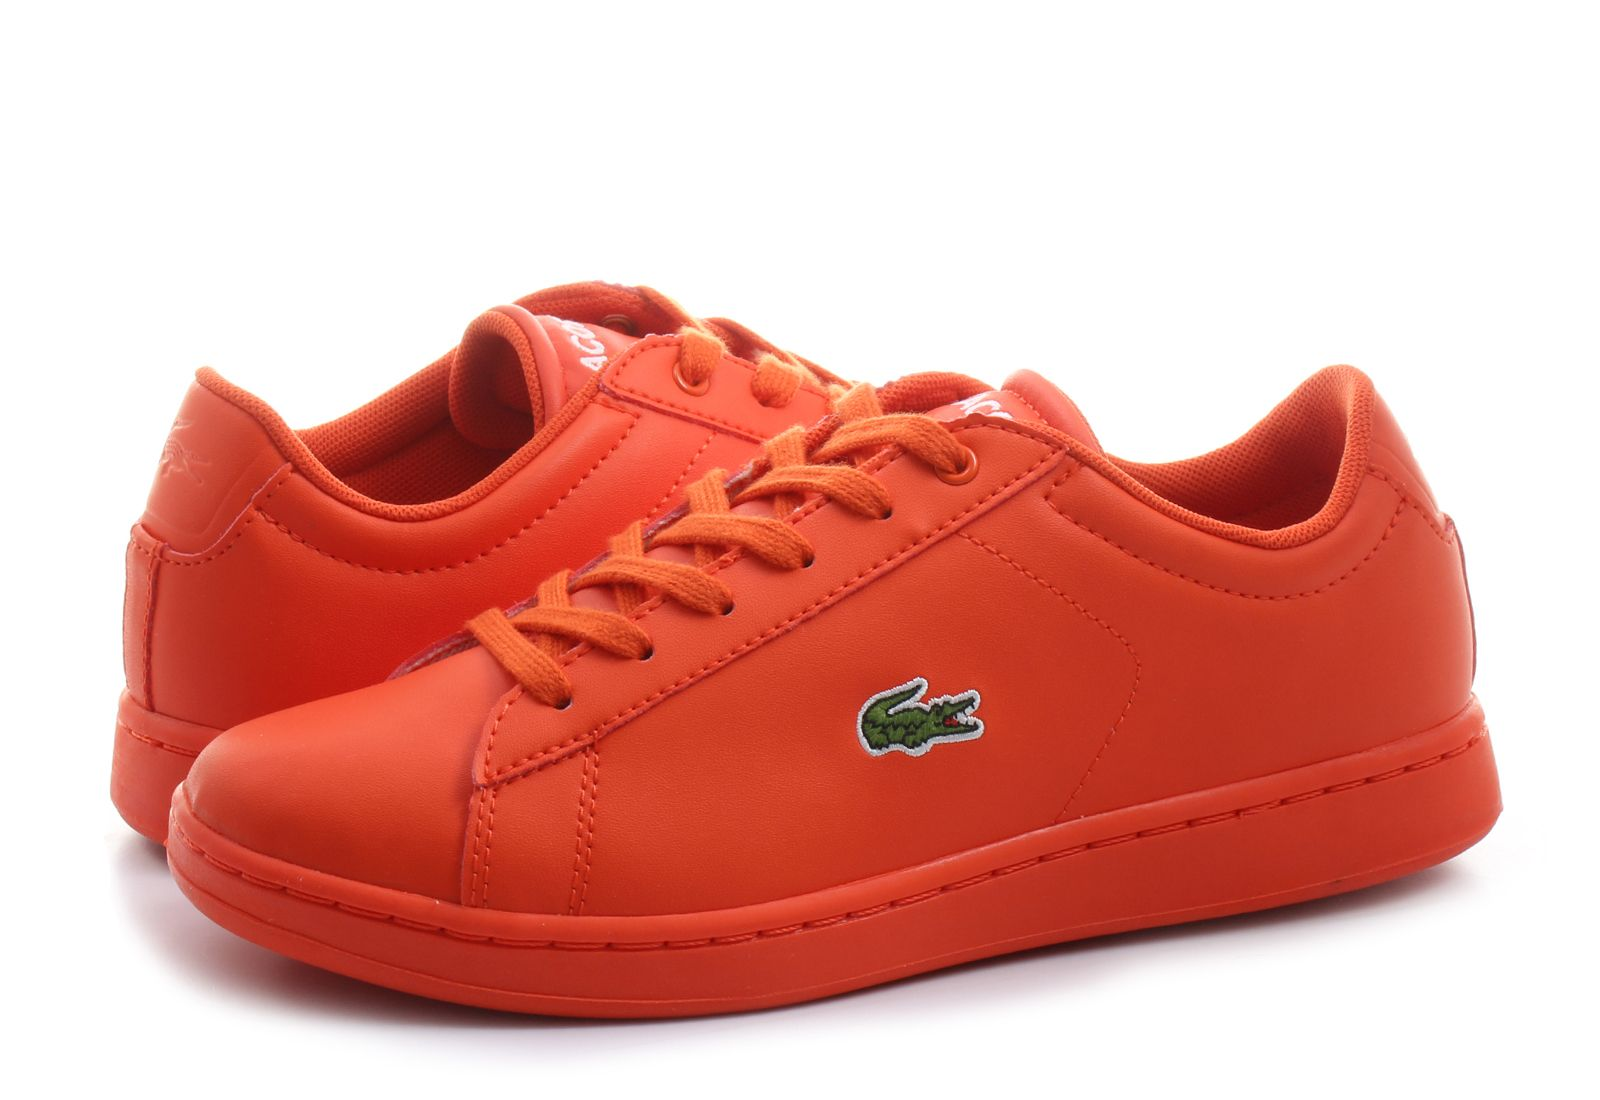 Lacoste Cipő - Carnaby Evo - 173SPJ0005-047 - Office Shoes ... ed7860e3e2